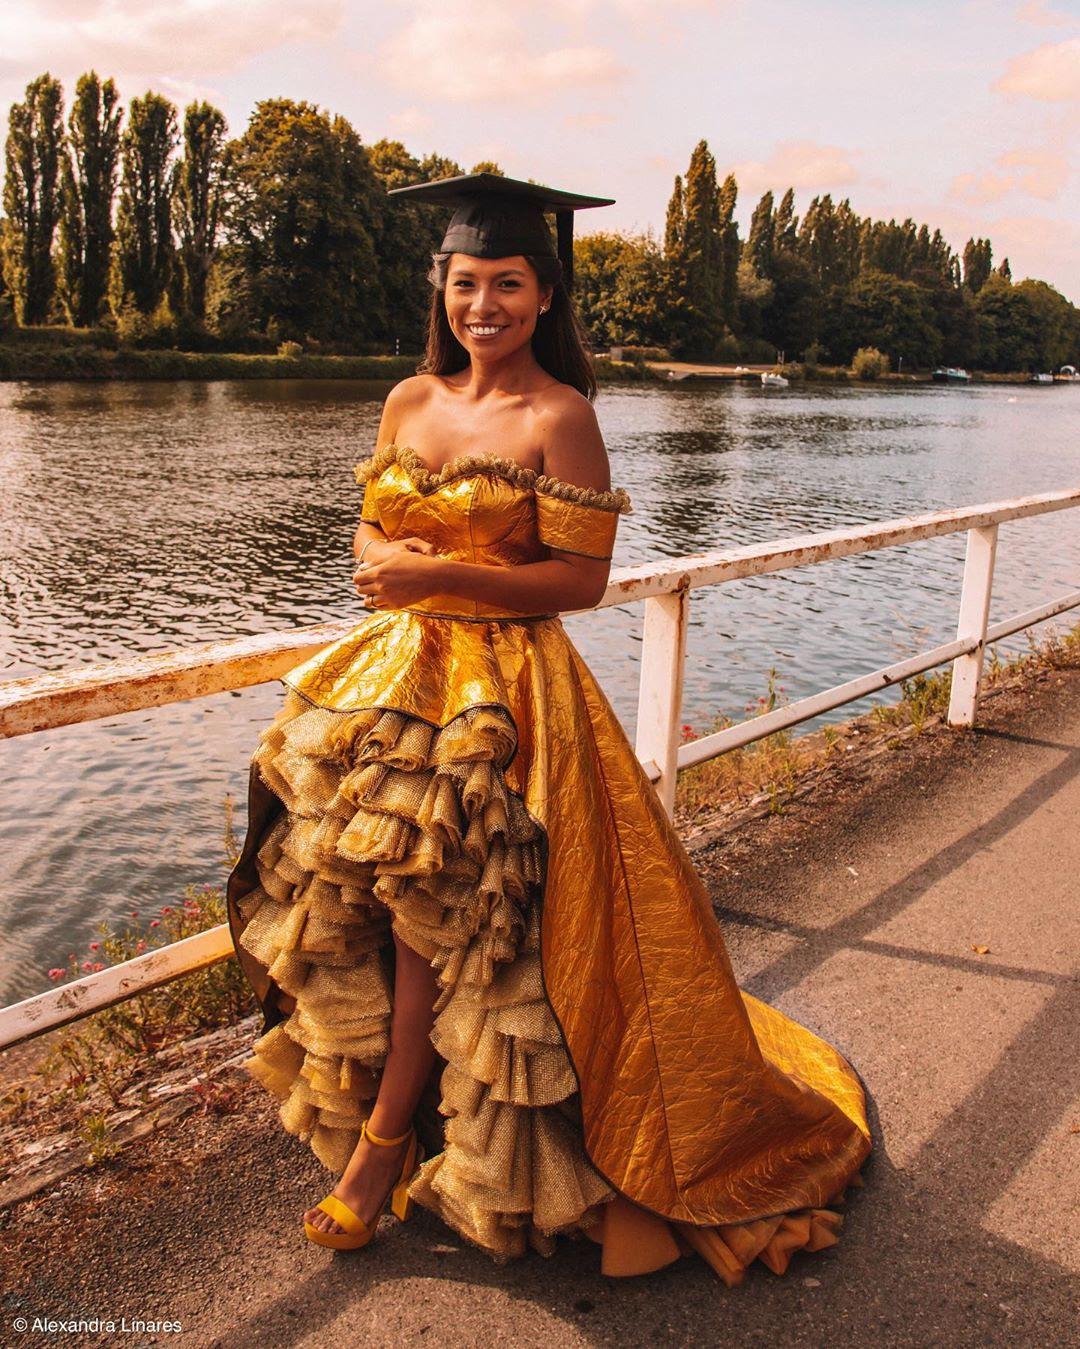 Graduation dress of pineapple fabric (Piñatex)